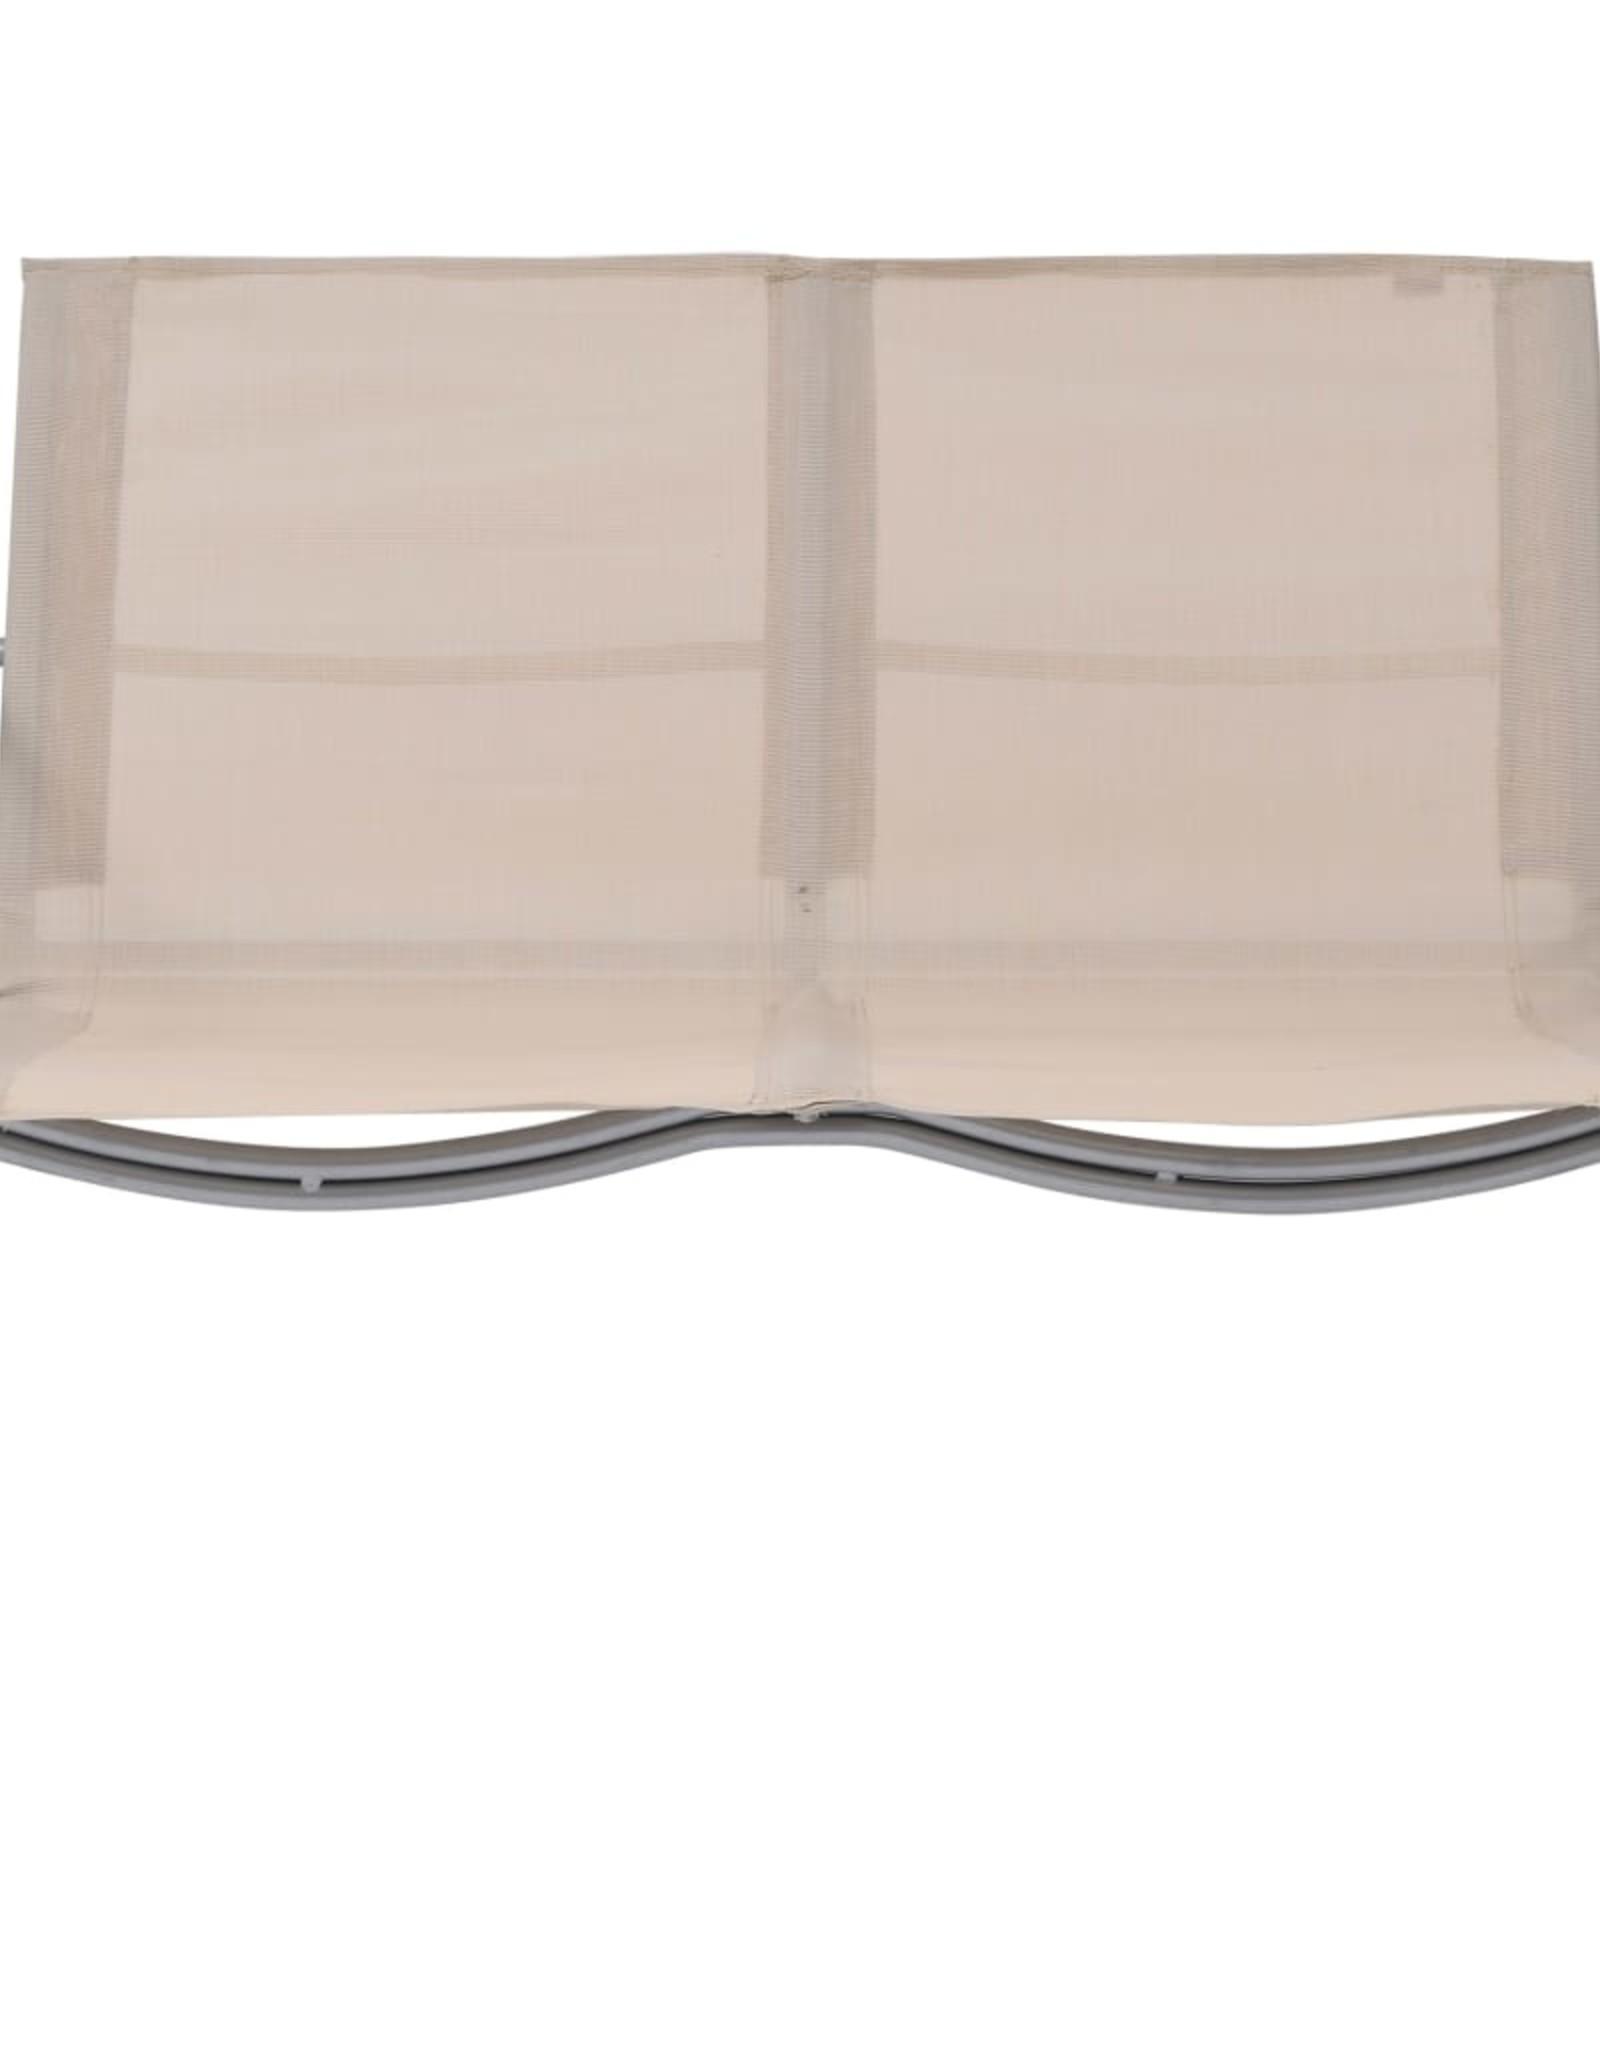 4-delige Loungeset stof en staal crèmekleurig